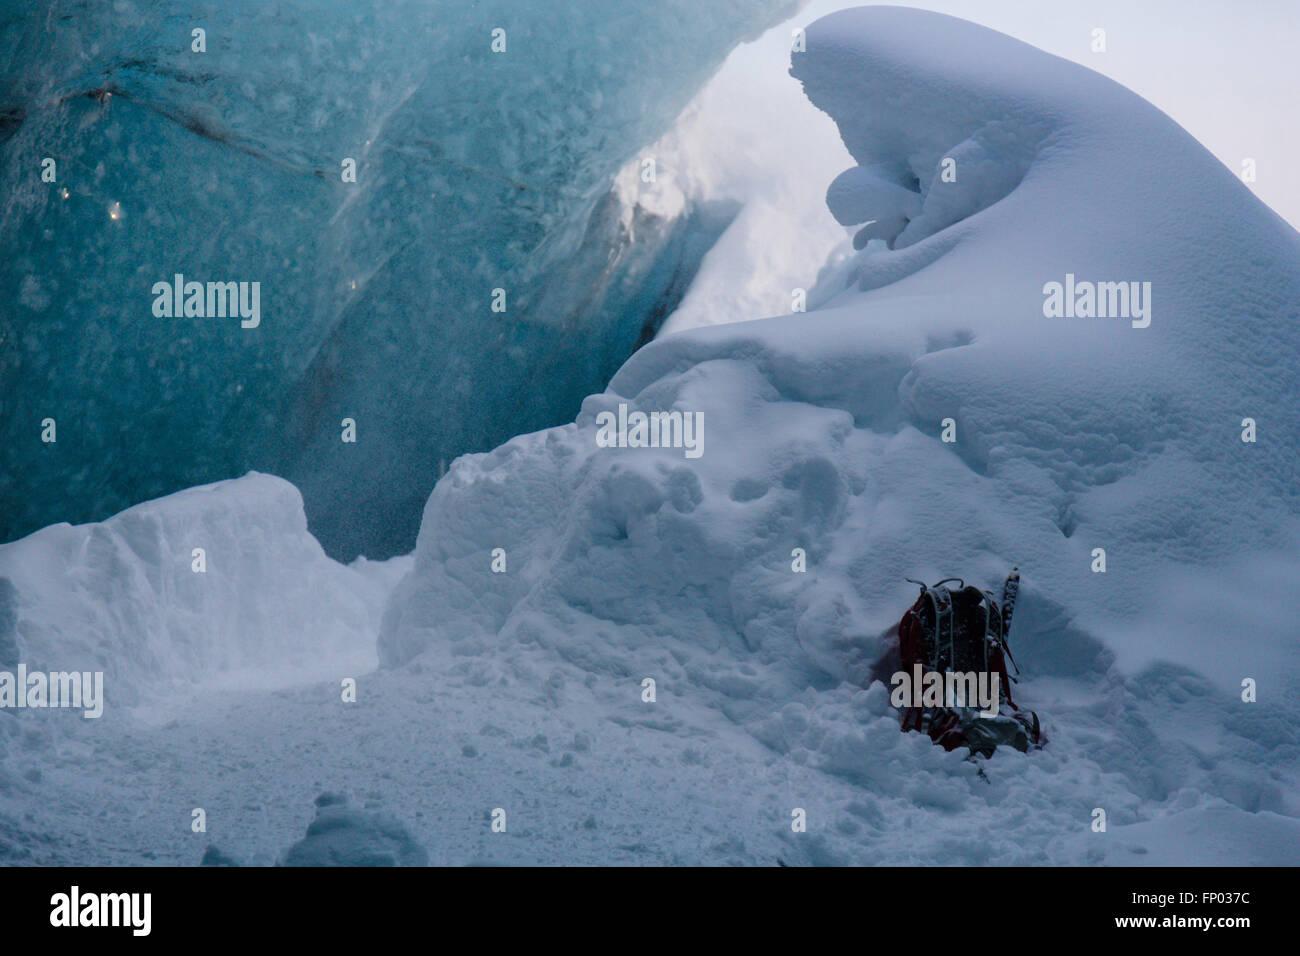 Ice Cave, Vatnajökull Nationalpark, Glacier, Iceland - Stock Image